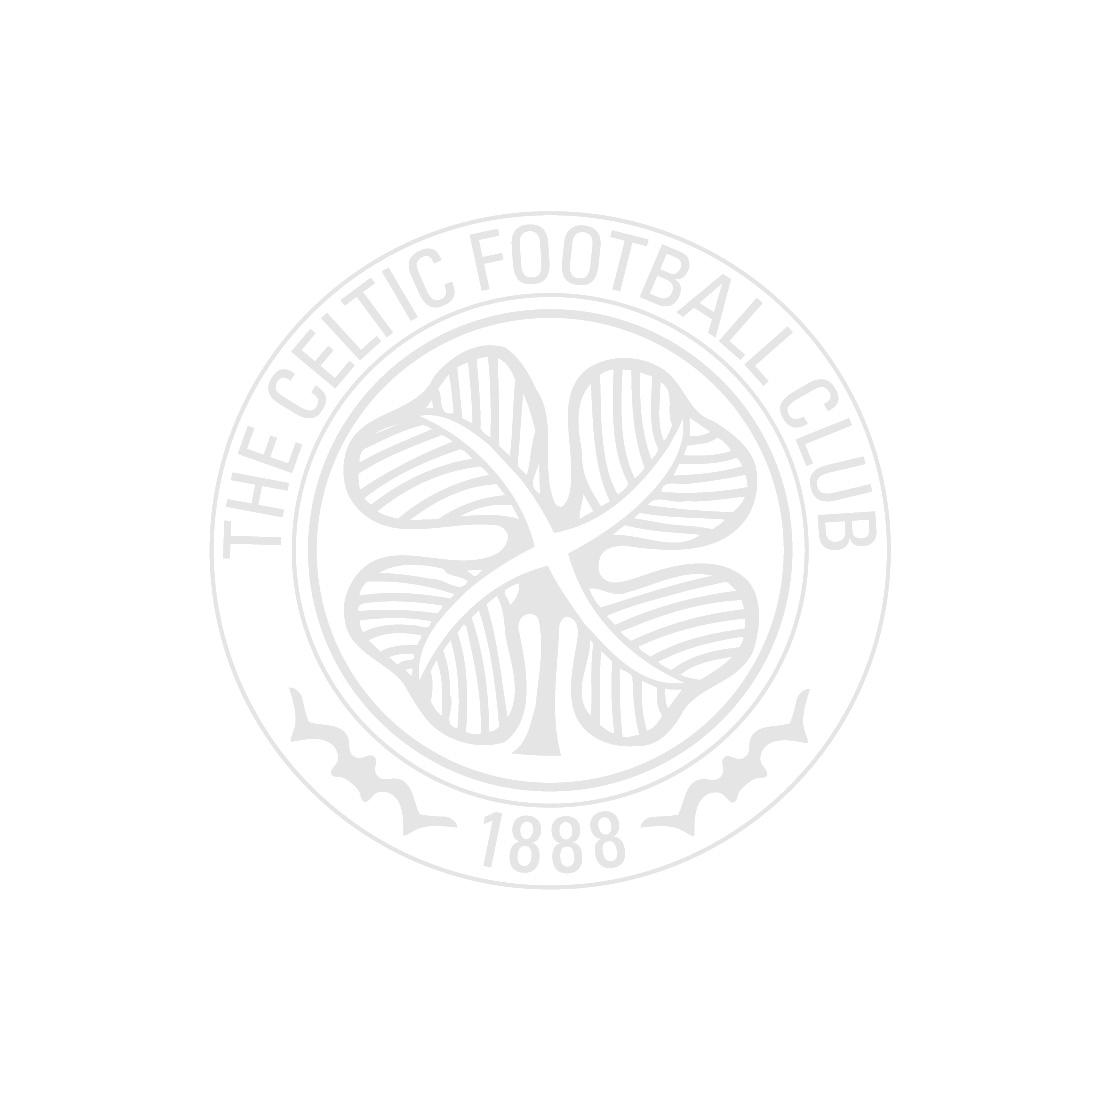 Celtic Crest Over The Ear Headphones